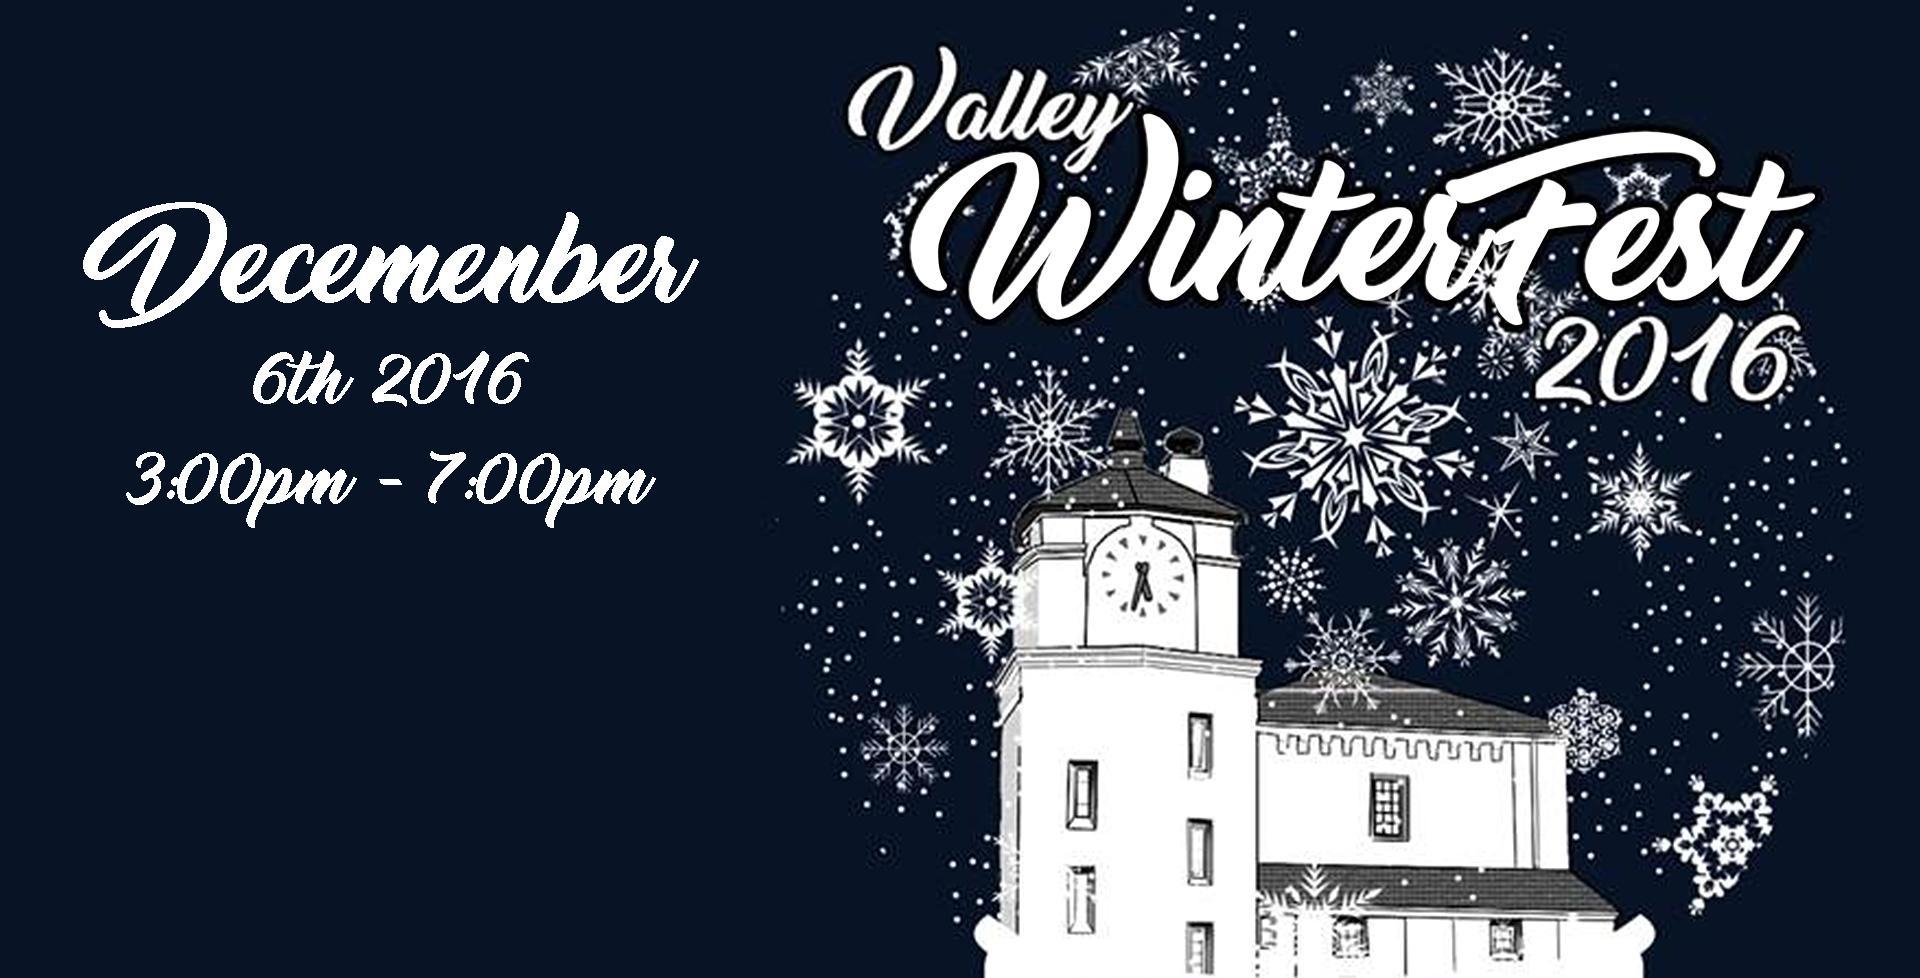 Valley WinterFest 2016